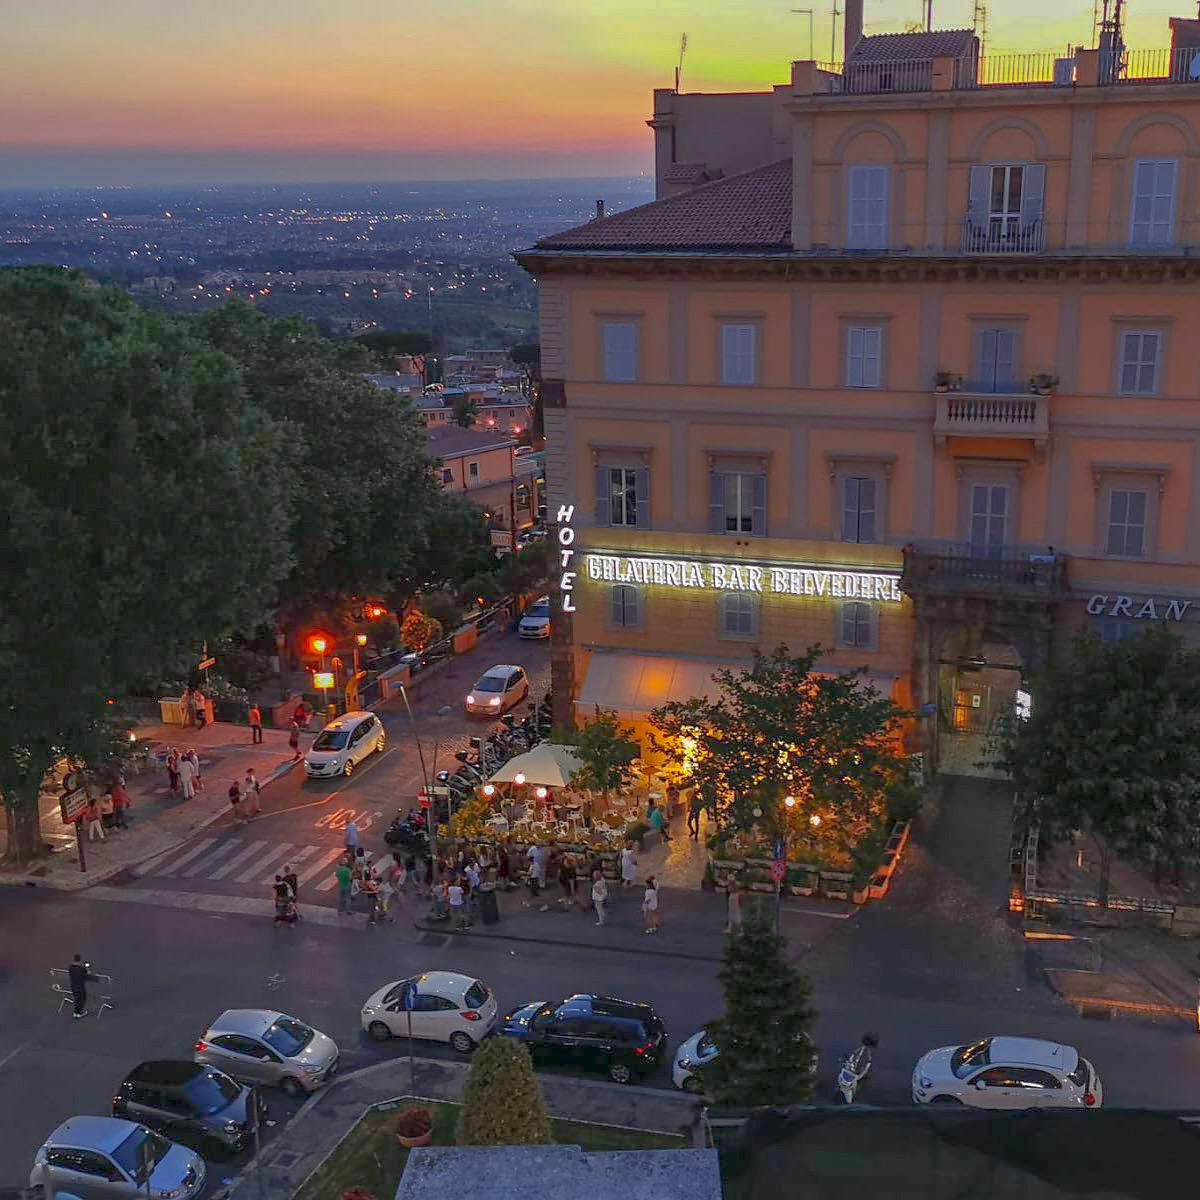 B-Café-Belvedere-a-Frascati-Aperitivo-Frascati-Colazione-Frascati-Cocktail-Frascati-Gelato-Frascati-Merenda-Frascati-Festa-Frascati-Pranzo-Frascati